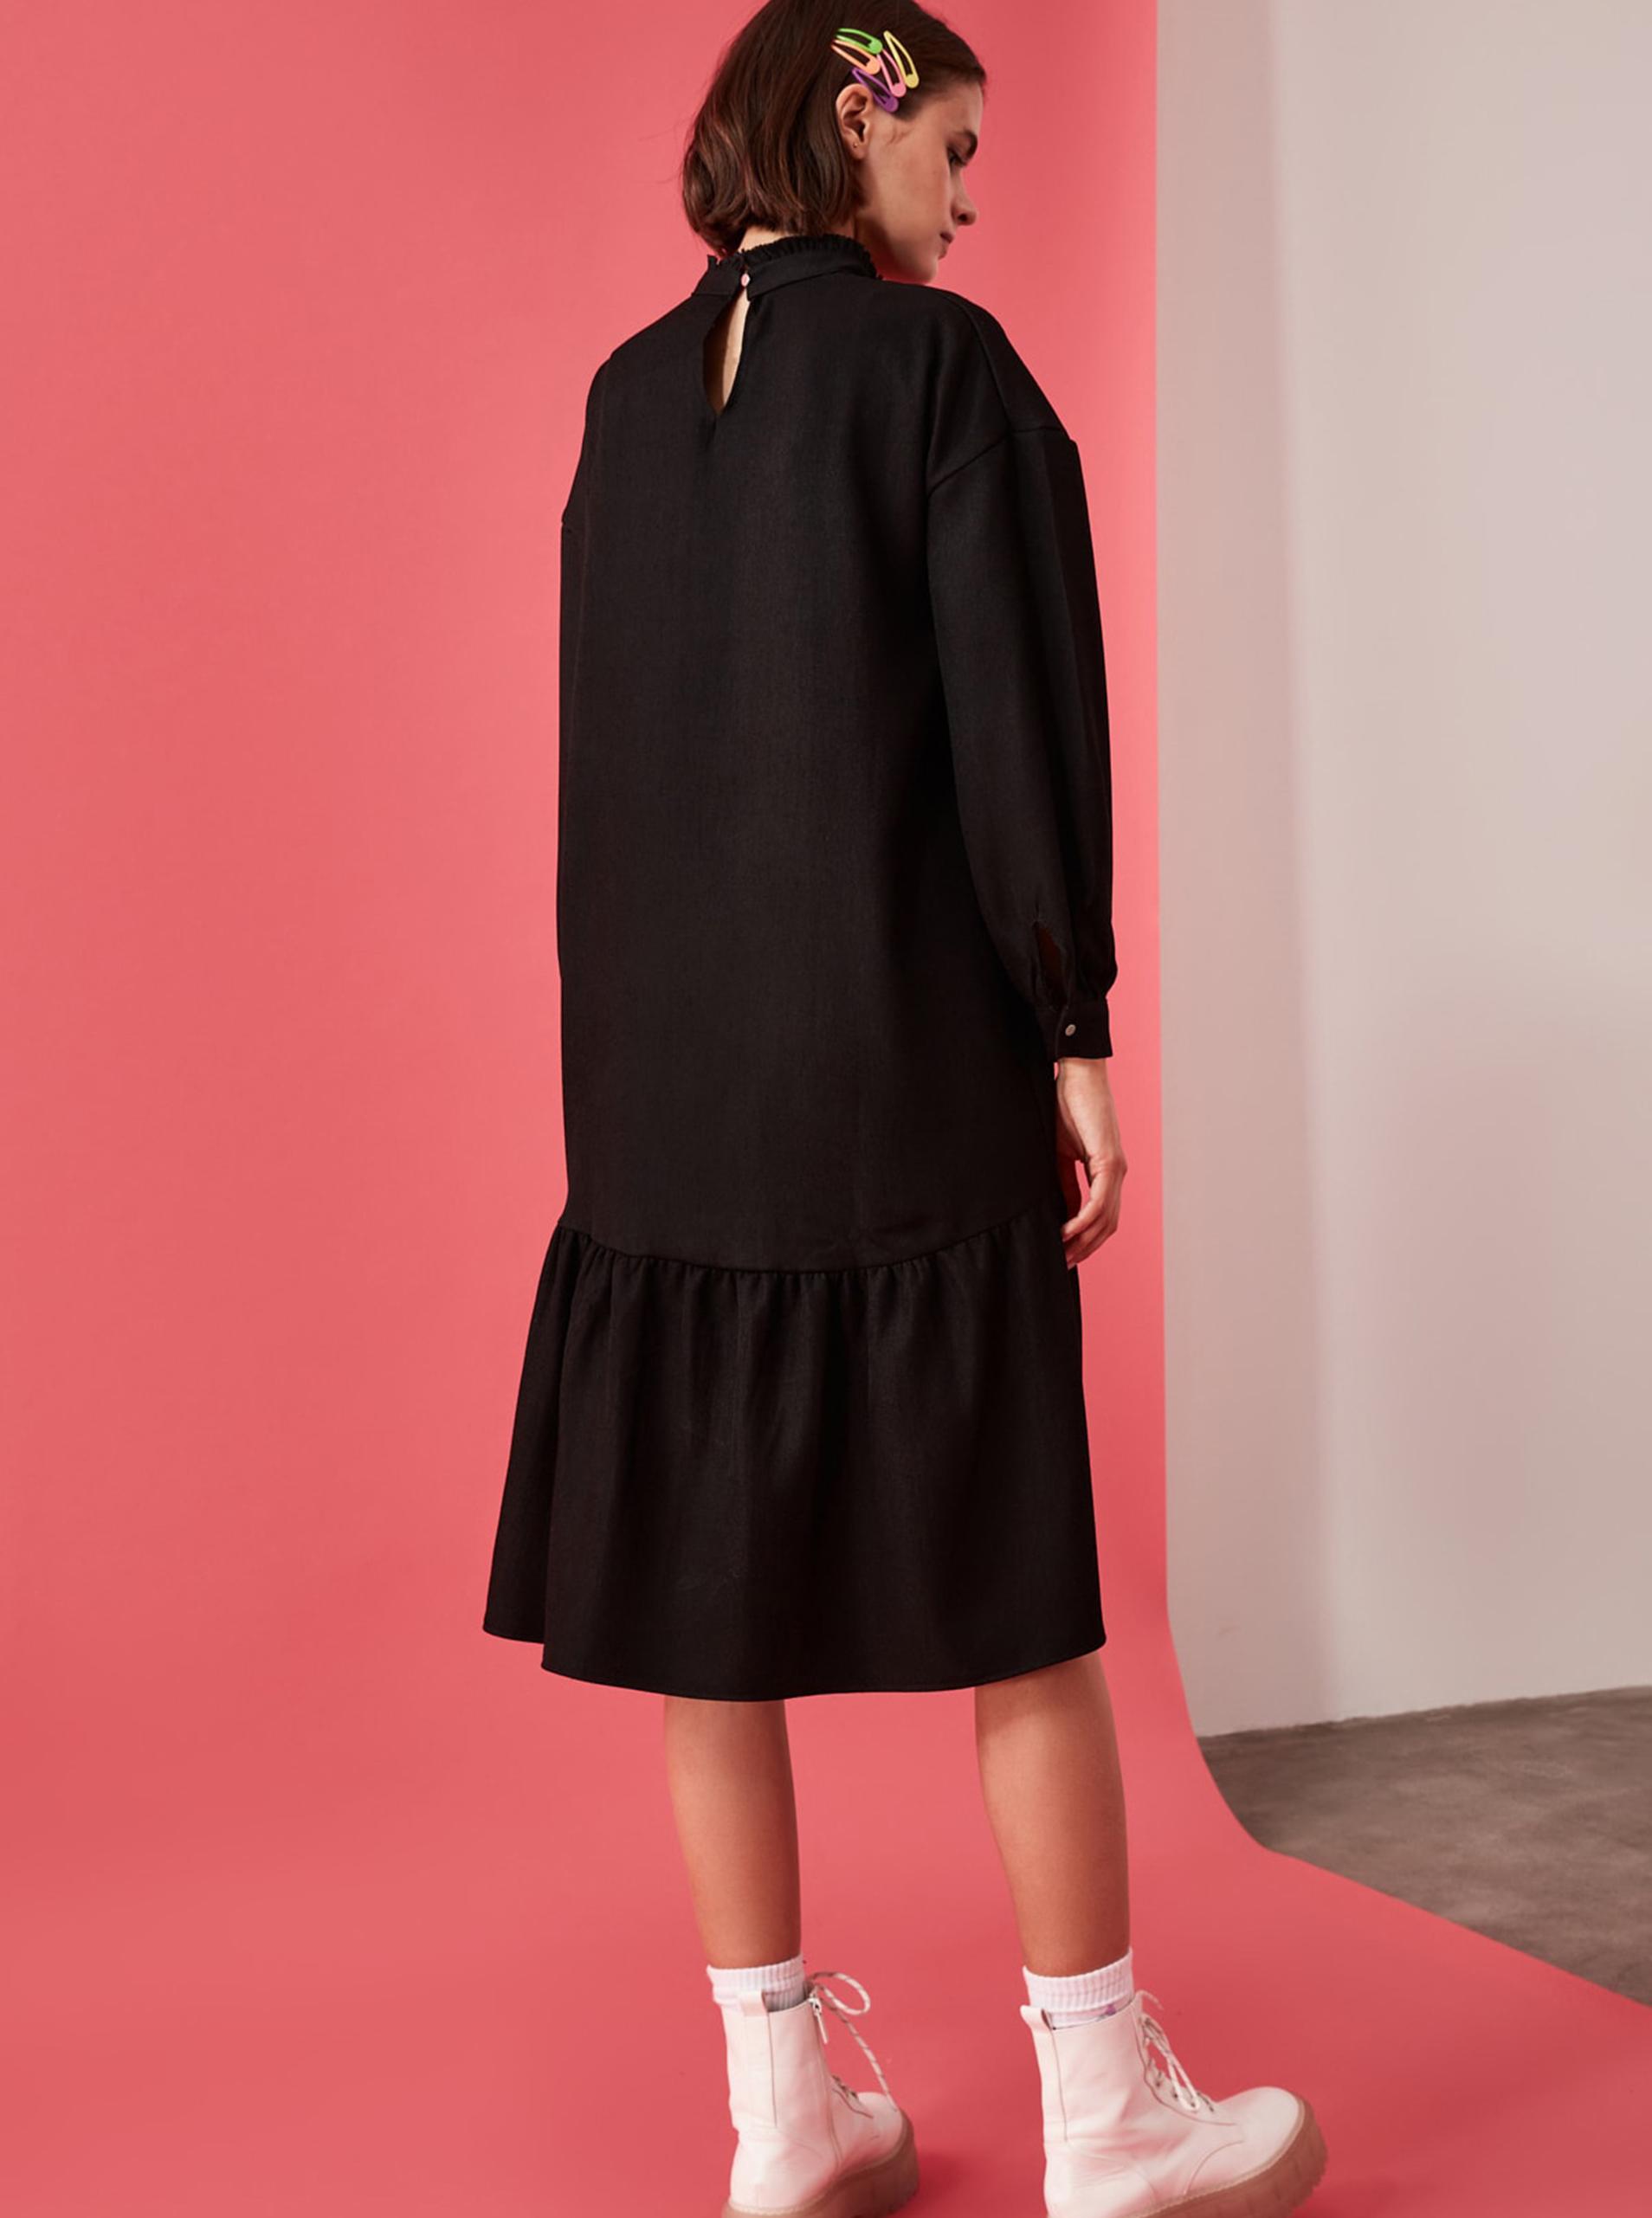 Black woolen midi dress with Trendyol print